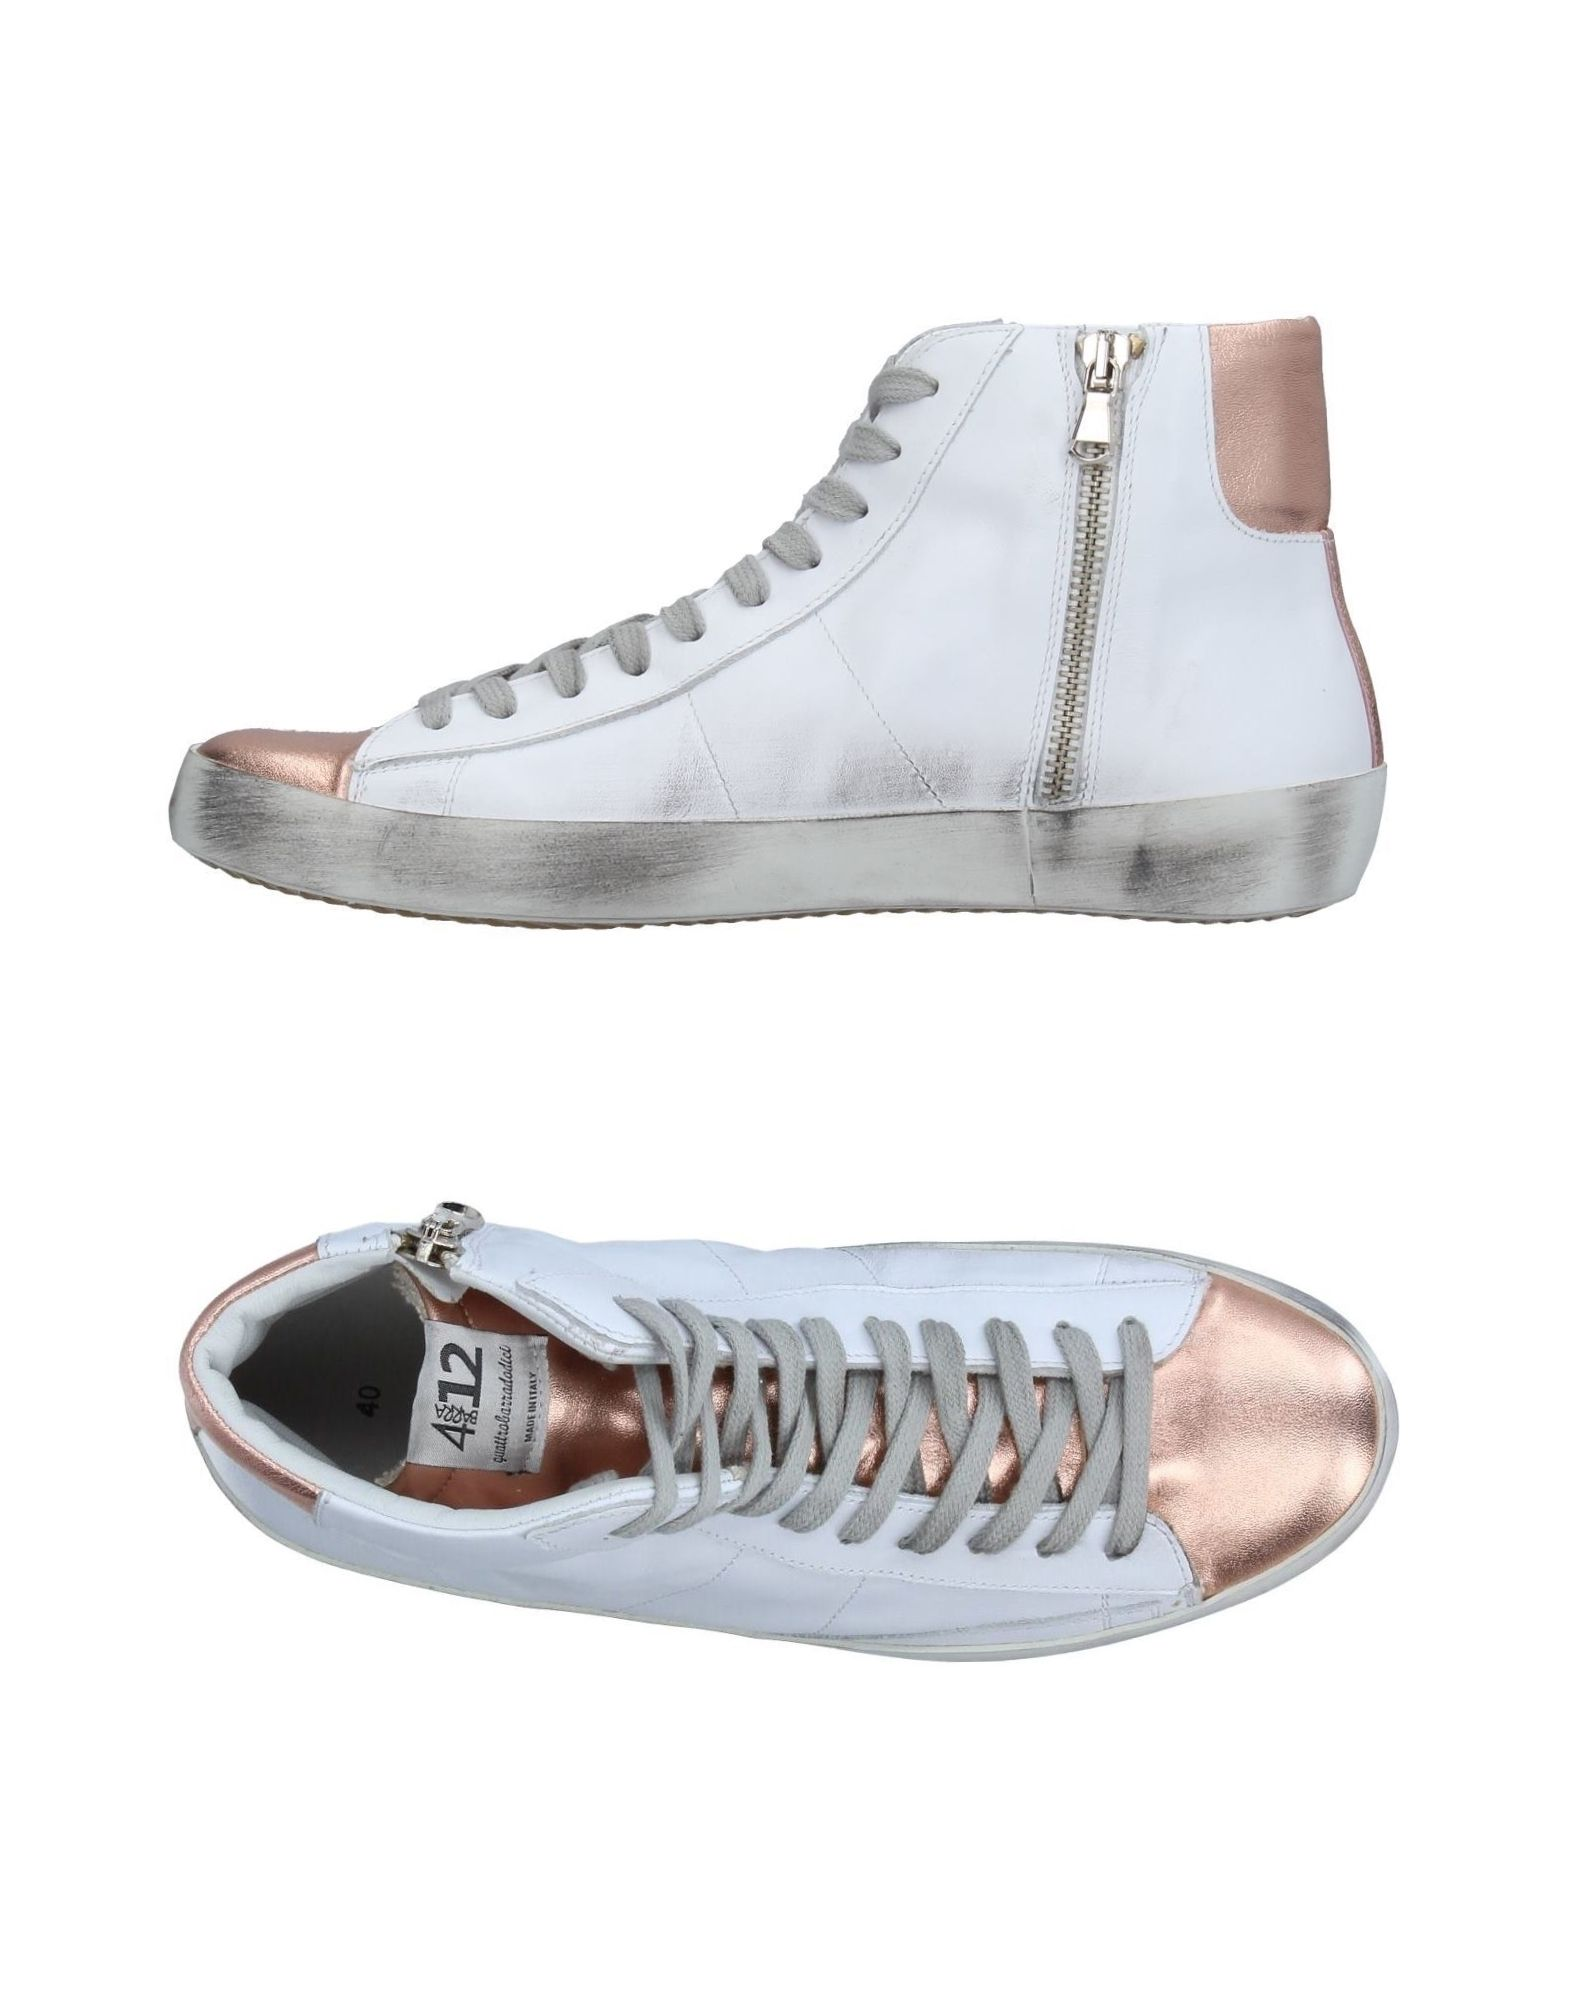 Quattrobarradodici Sneakers Damen  11266072AG Gute Qualität beliebte Schuhe